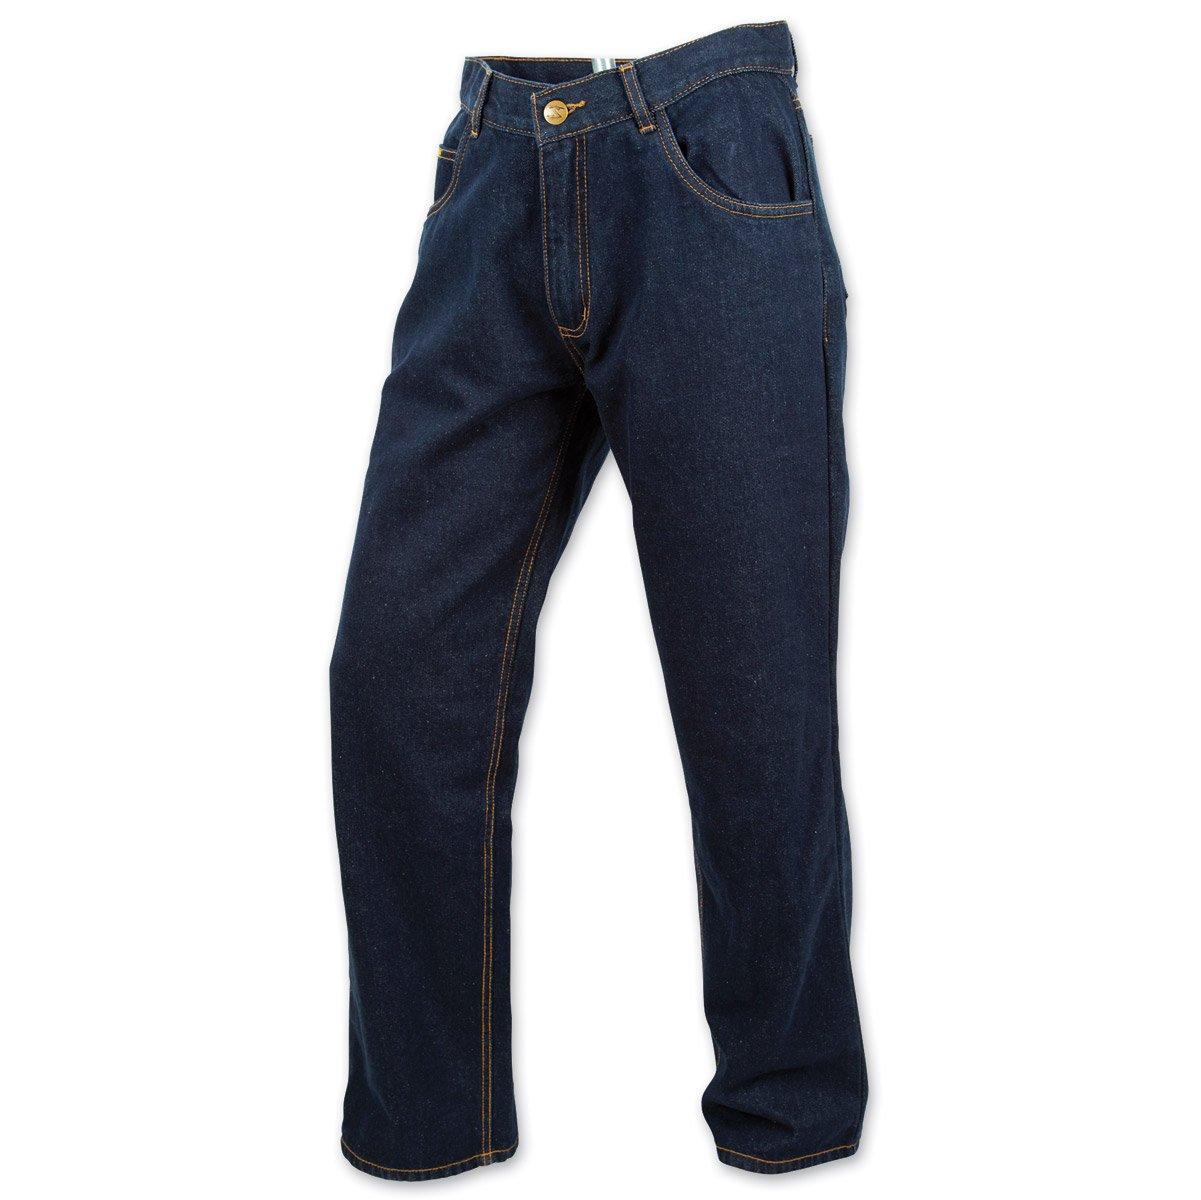 Black, Size 42 ScorpionExo Covert Jeans Mens Reinforced Motorcycle Pants